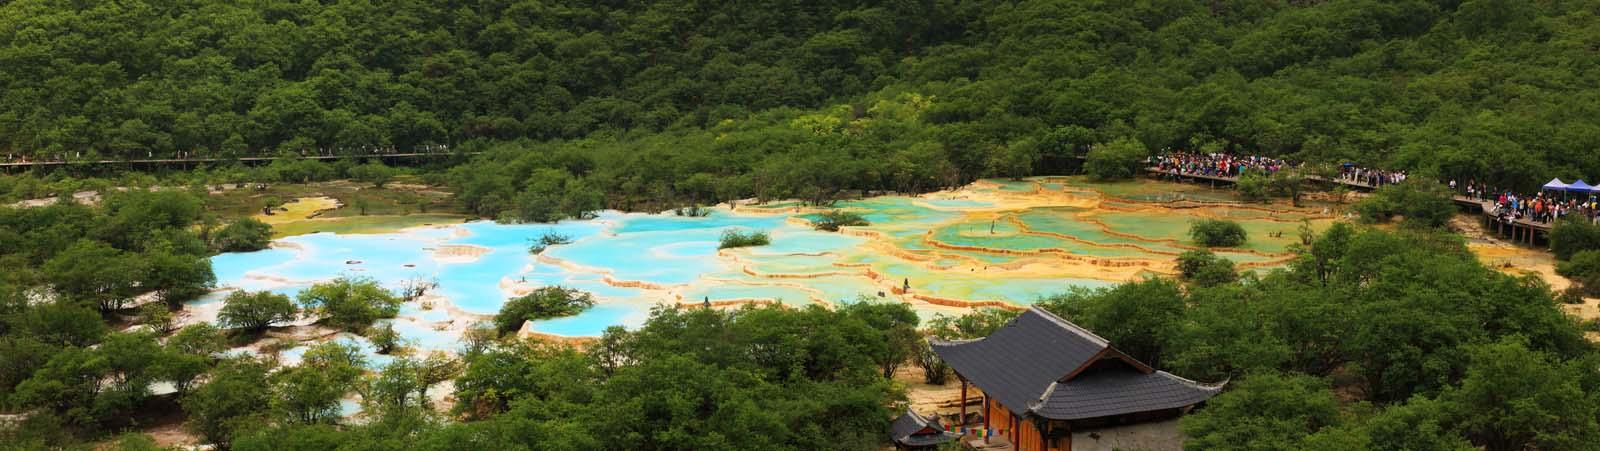 foto,tela,gratis,paisaje,fotografía,idea,Cinco colores Huanglong estanque, , , ,